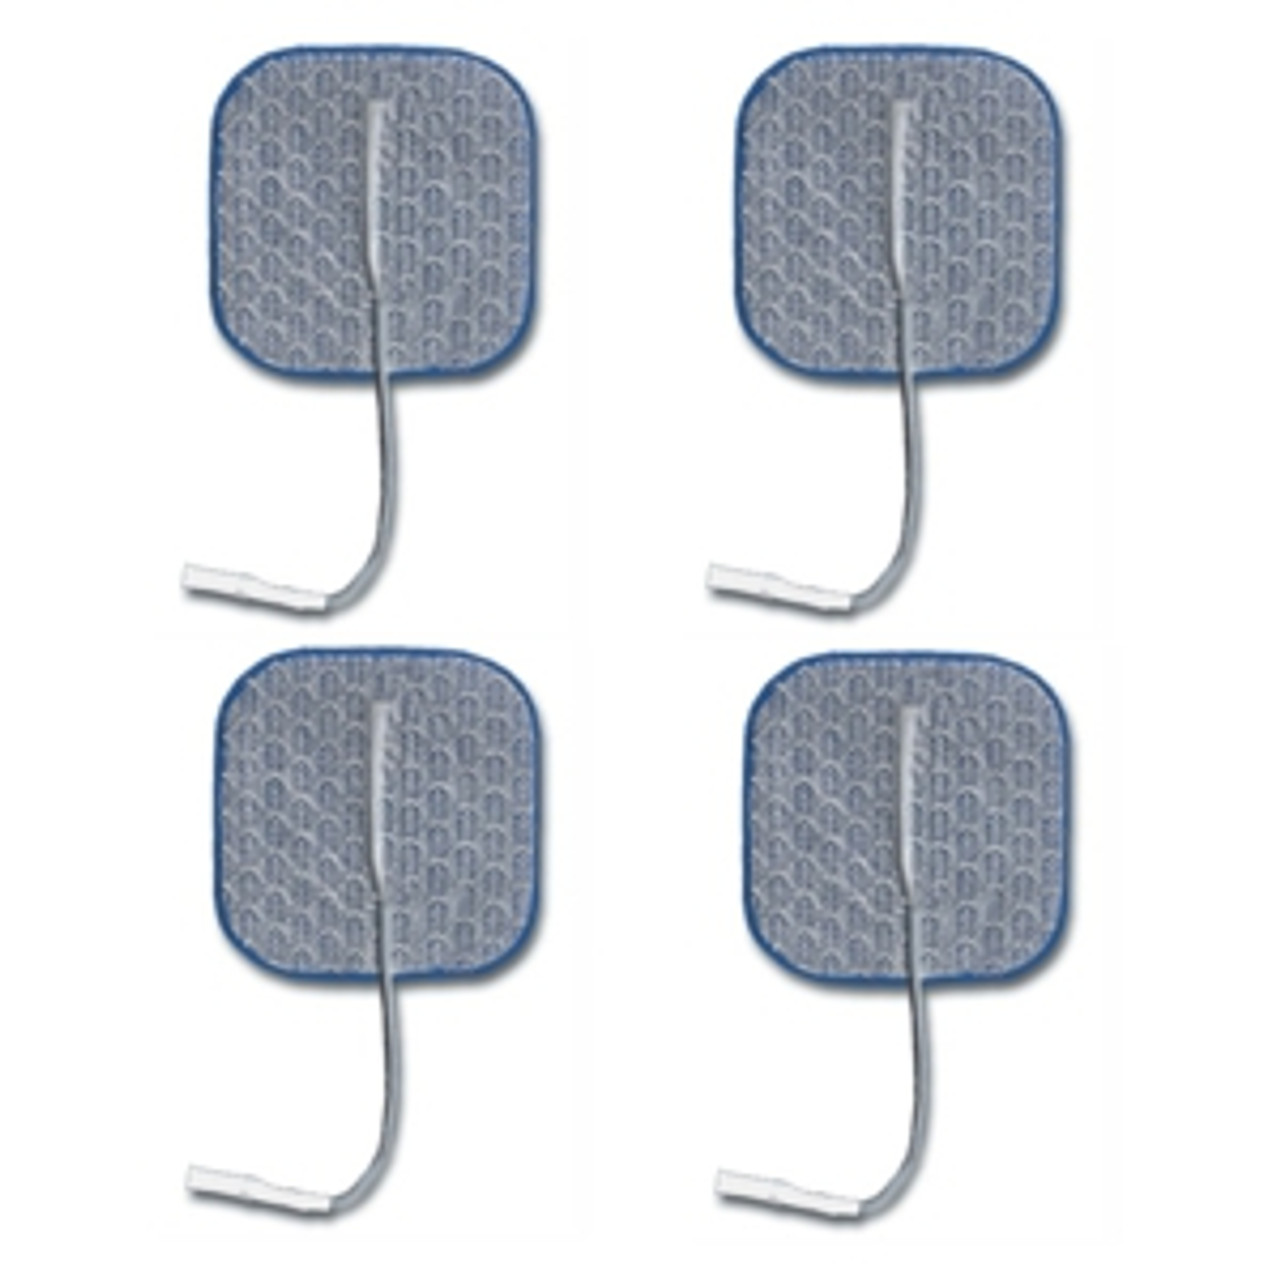 "Replacement Electrodes Sensitive Skin - Size 2""x2"" (4 pcs.)"